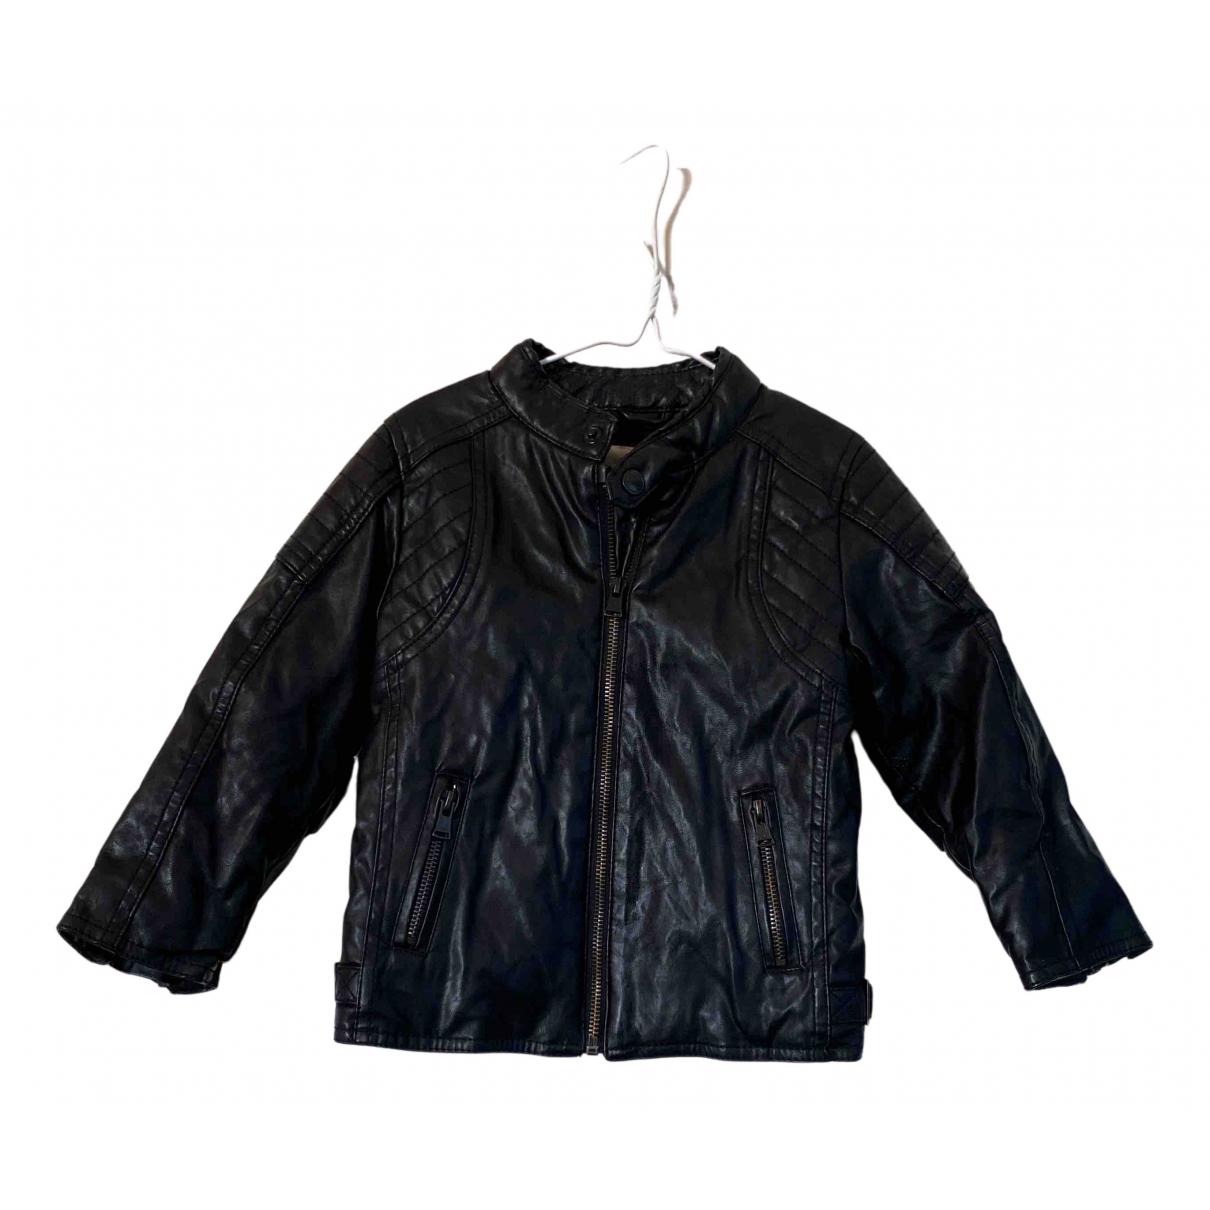 Zara N Black jacket & coat for Kids 4 years - up to 102cm FR